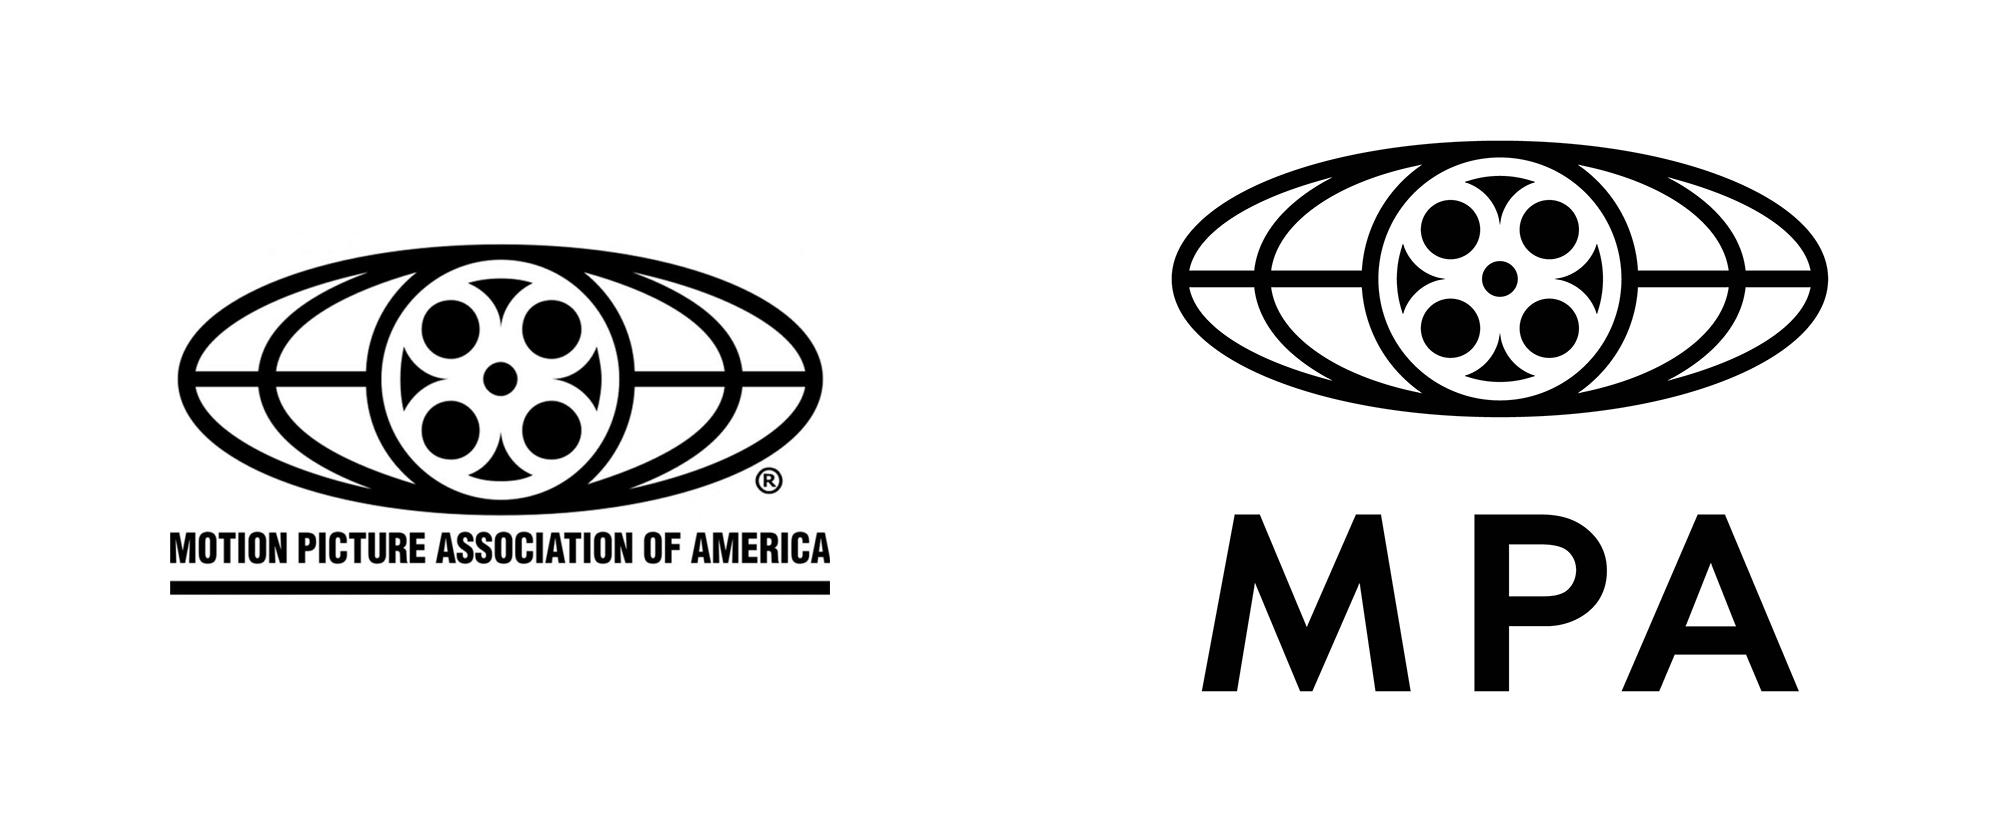 Brand New New Identity For Petbarn By Landor New Names Typography Branding Graphic Design Branding